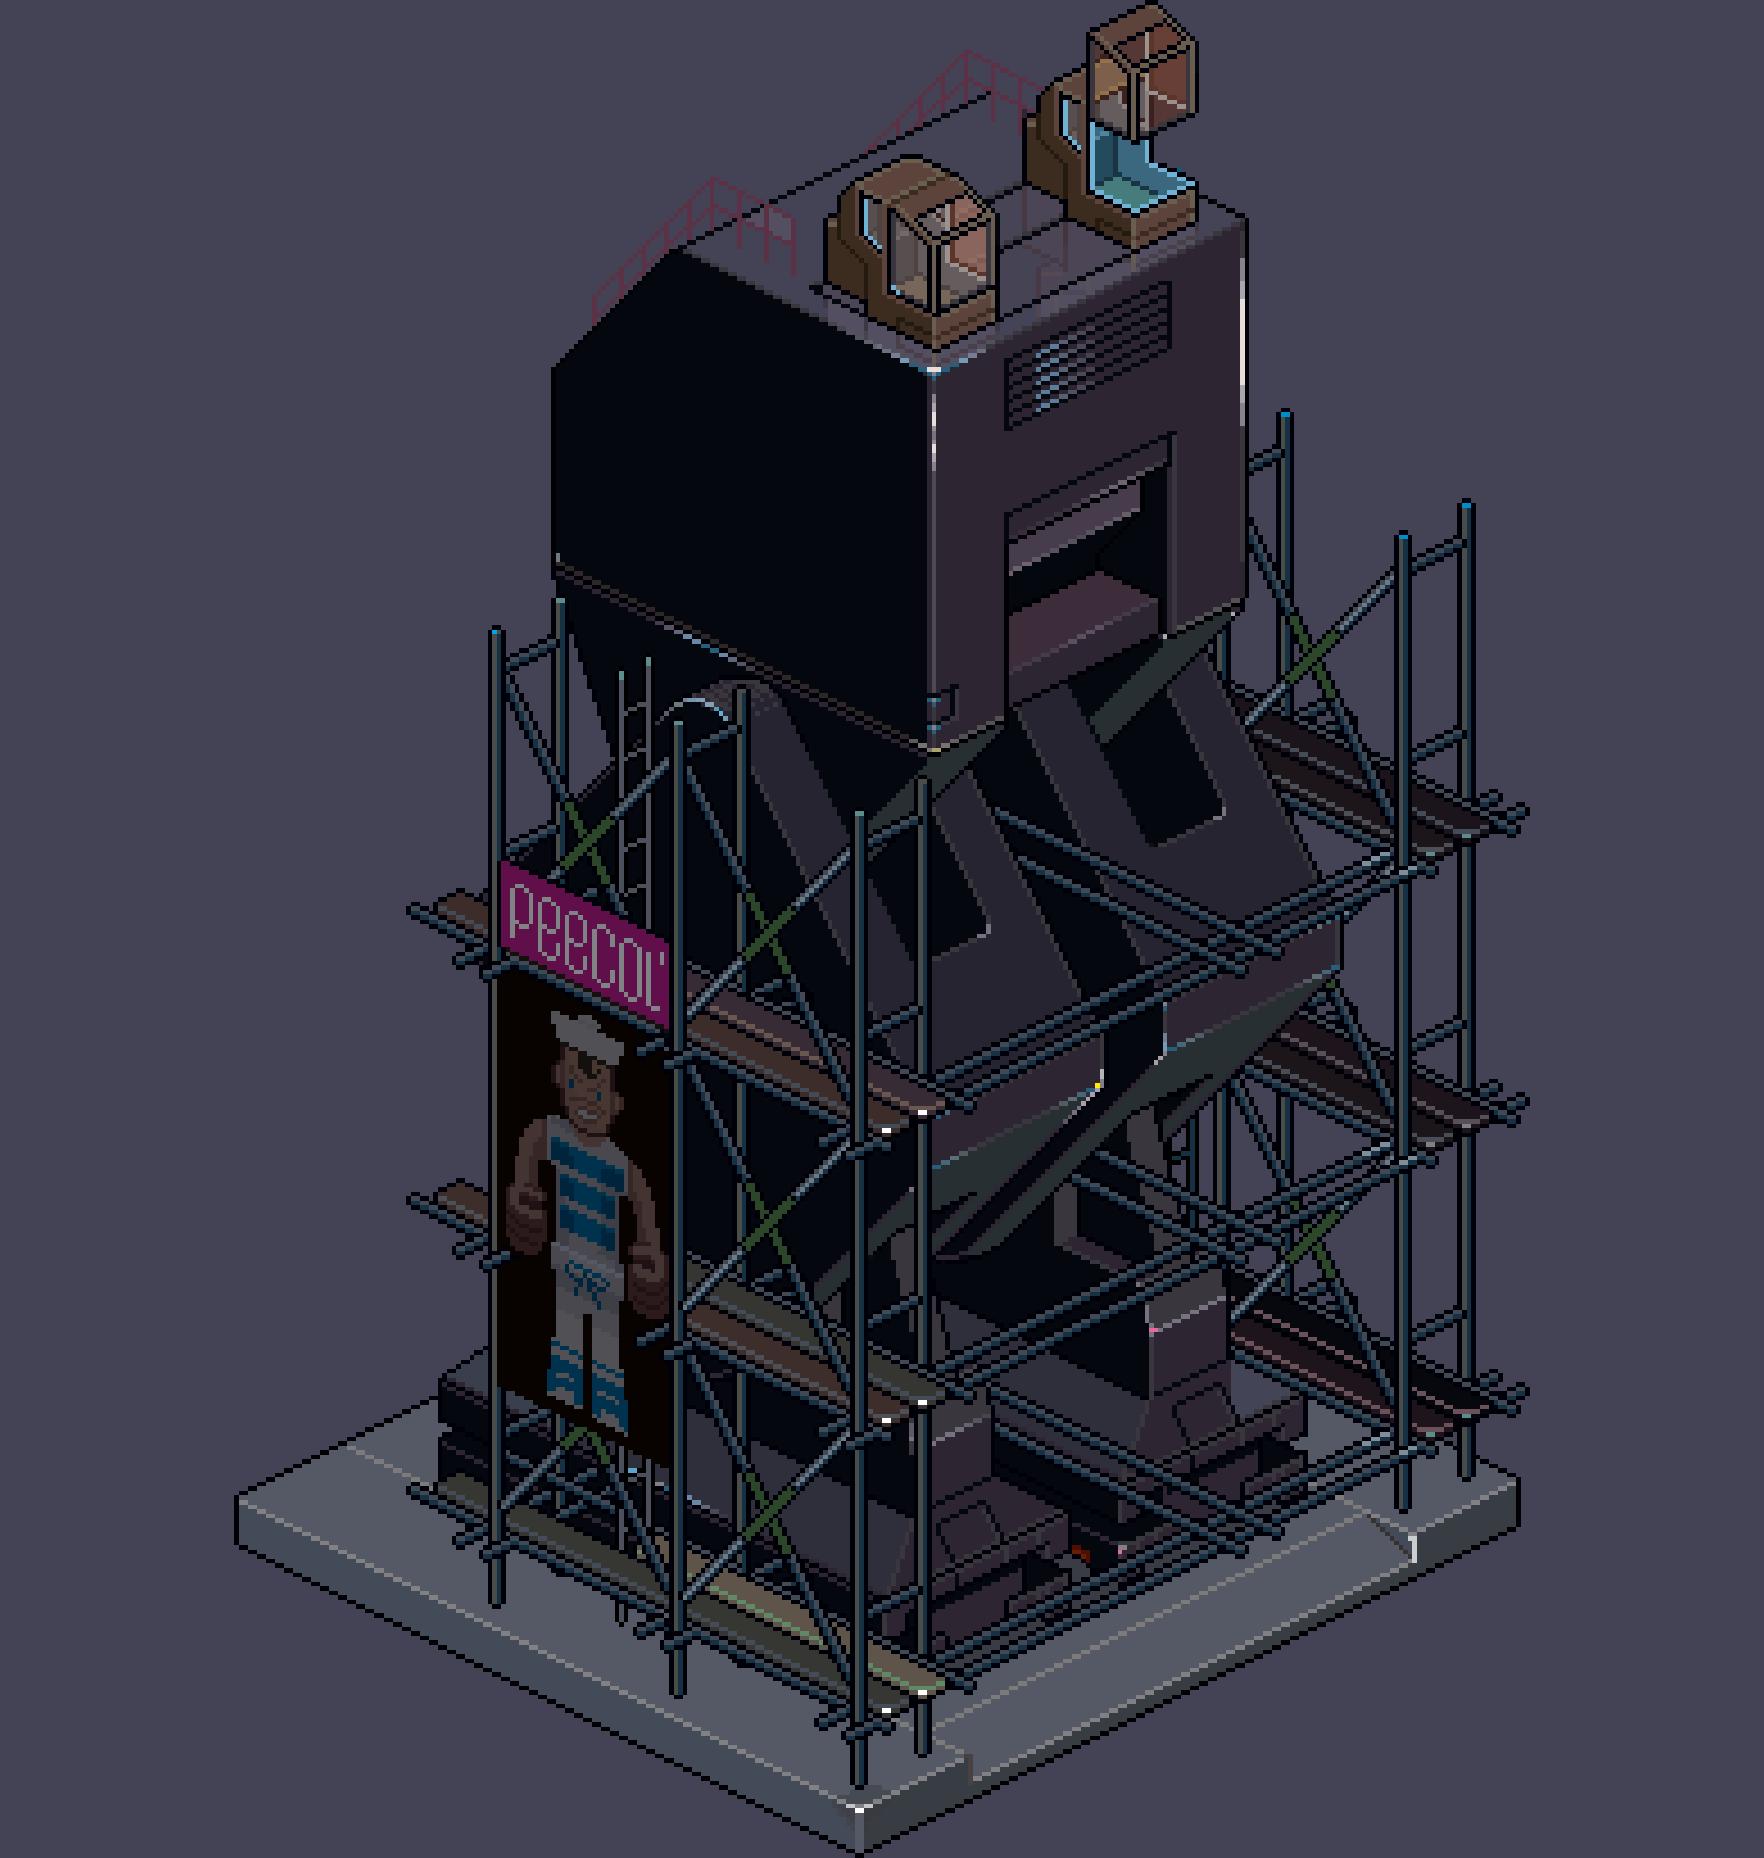 PT R2RobotCamouScaff NIGHT 03k 6x by eBoy